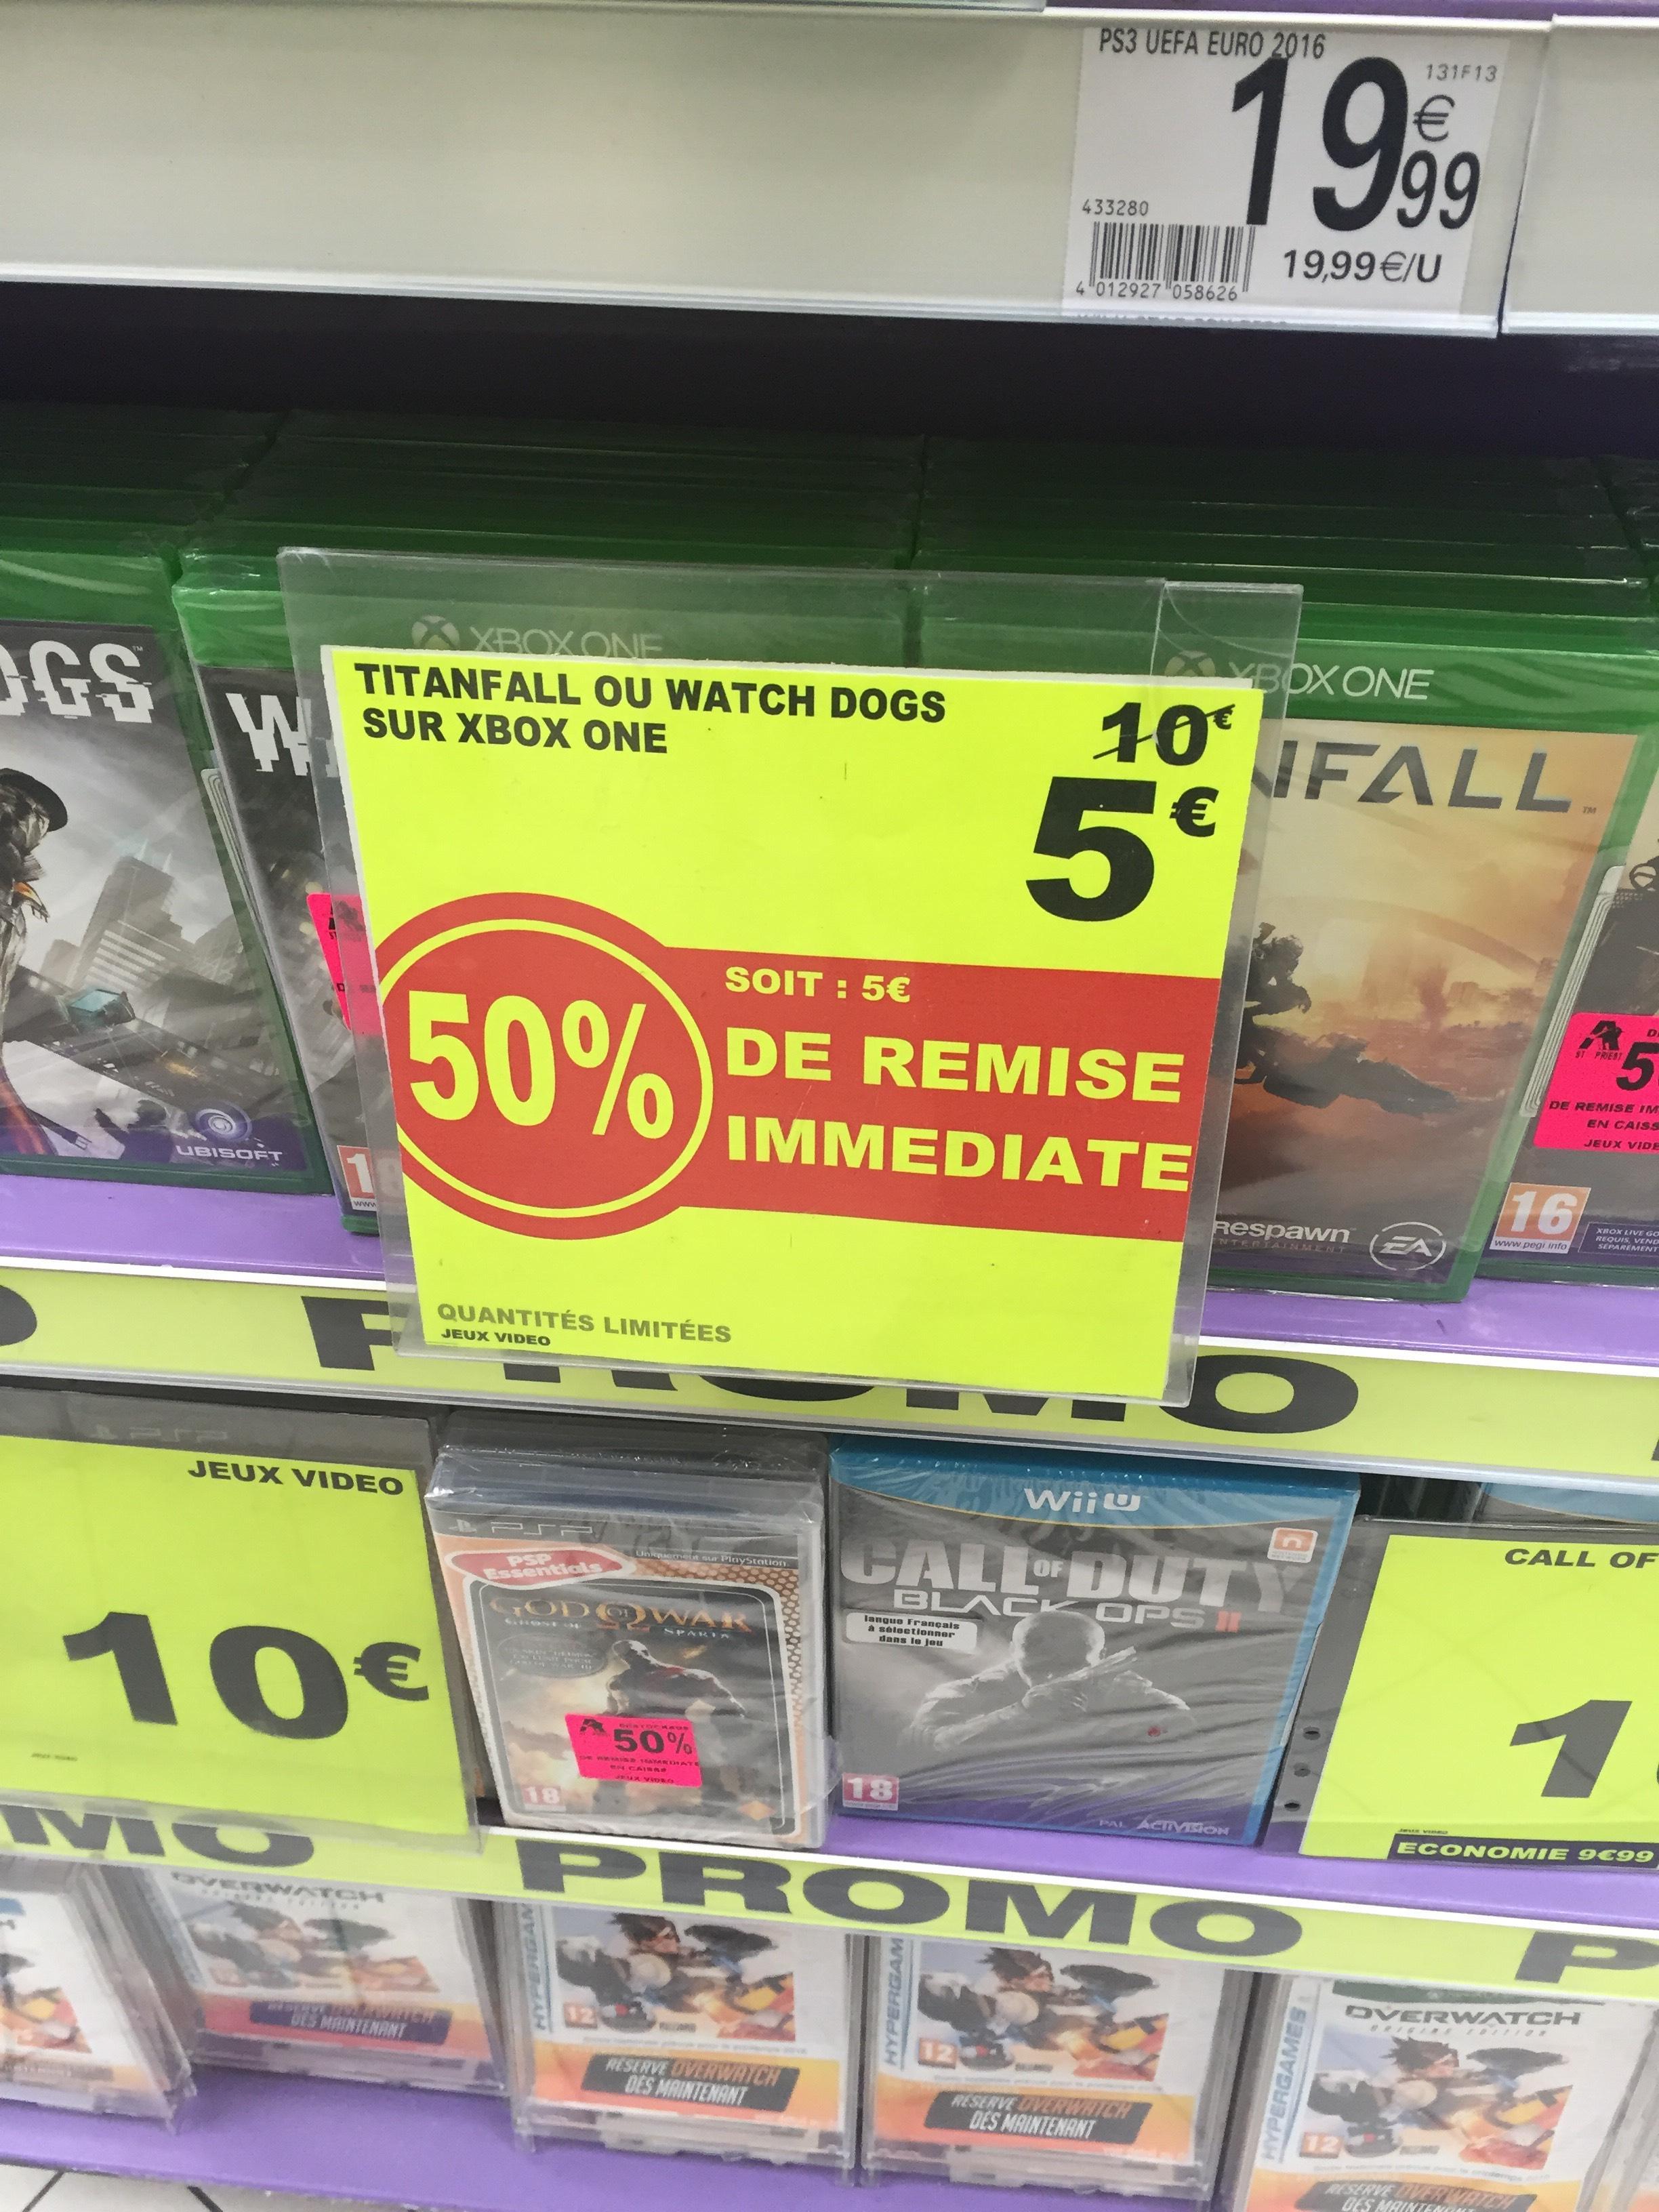 Watch Dogs ou Titan Fall sur Xbox one